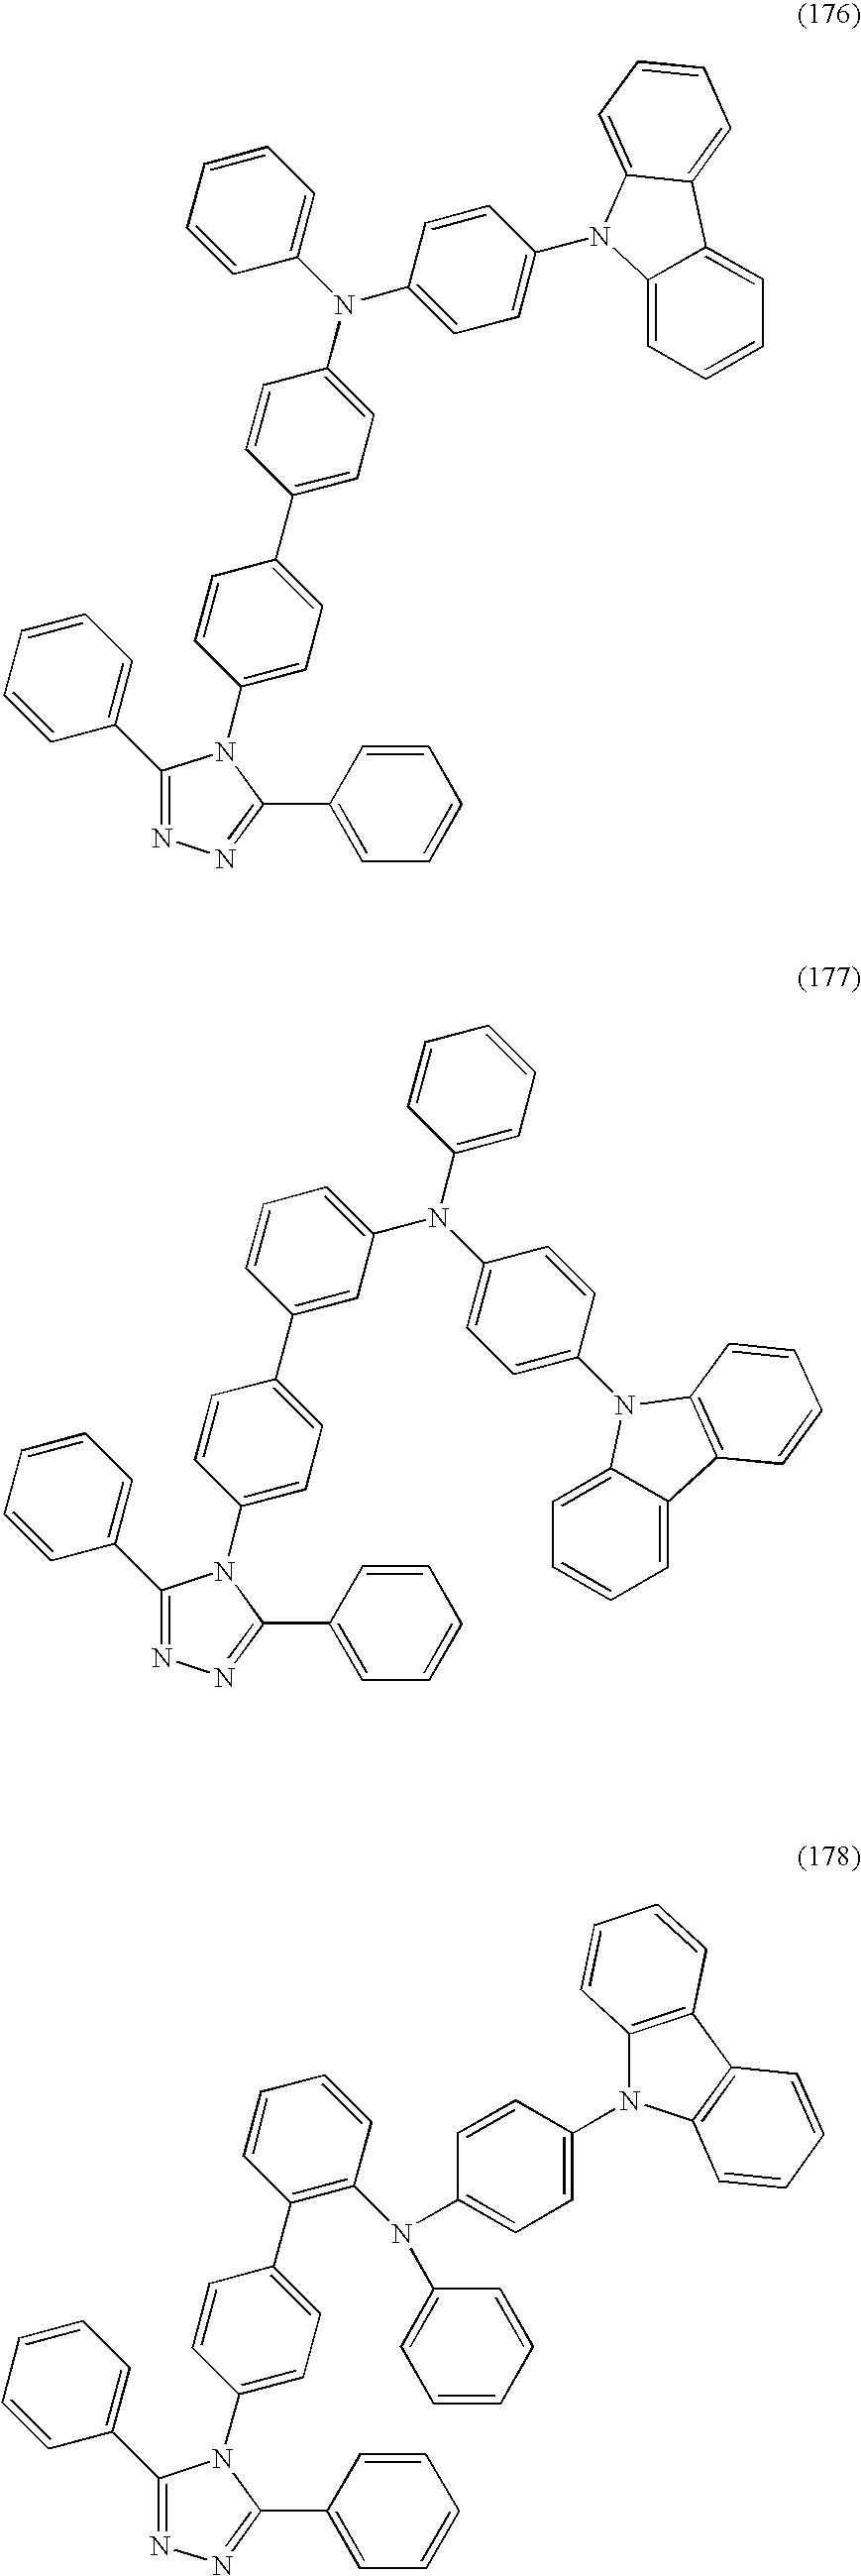 Us8906518b2 Triazole Derivative Light Emitting Element Hf Data Diagrams O 2 Meta Dibromobenzene Figure Us08906518 20141209 C00077